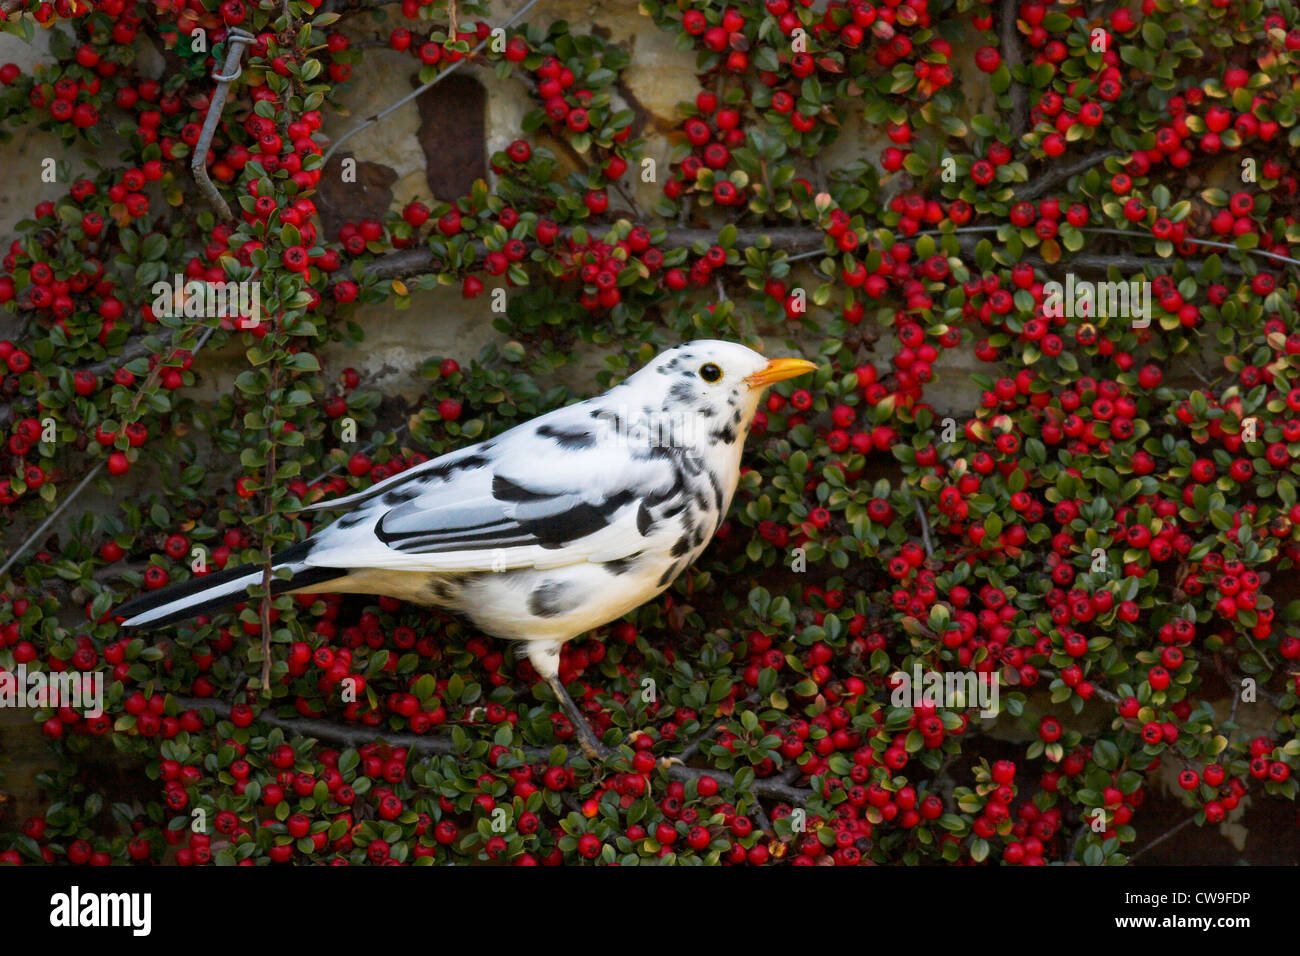 BLACKBIRD (Turdus merula) leucistic form on garden cotoneaster, Slaugham, Sussex, UK. - Stock Image